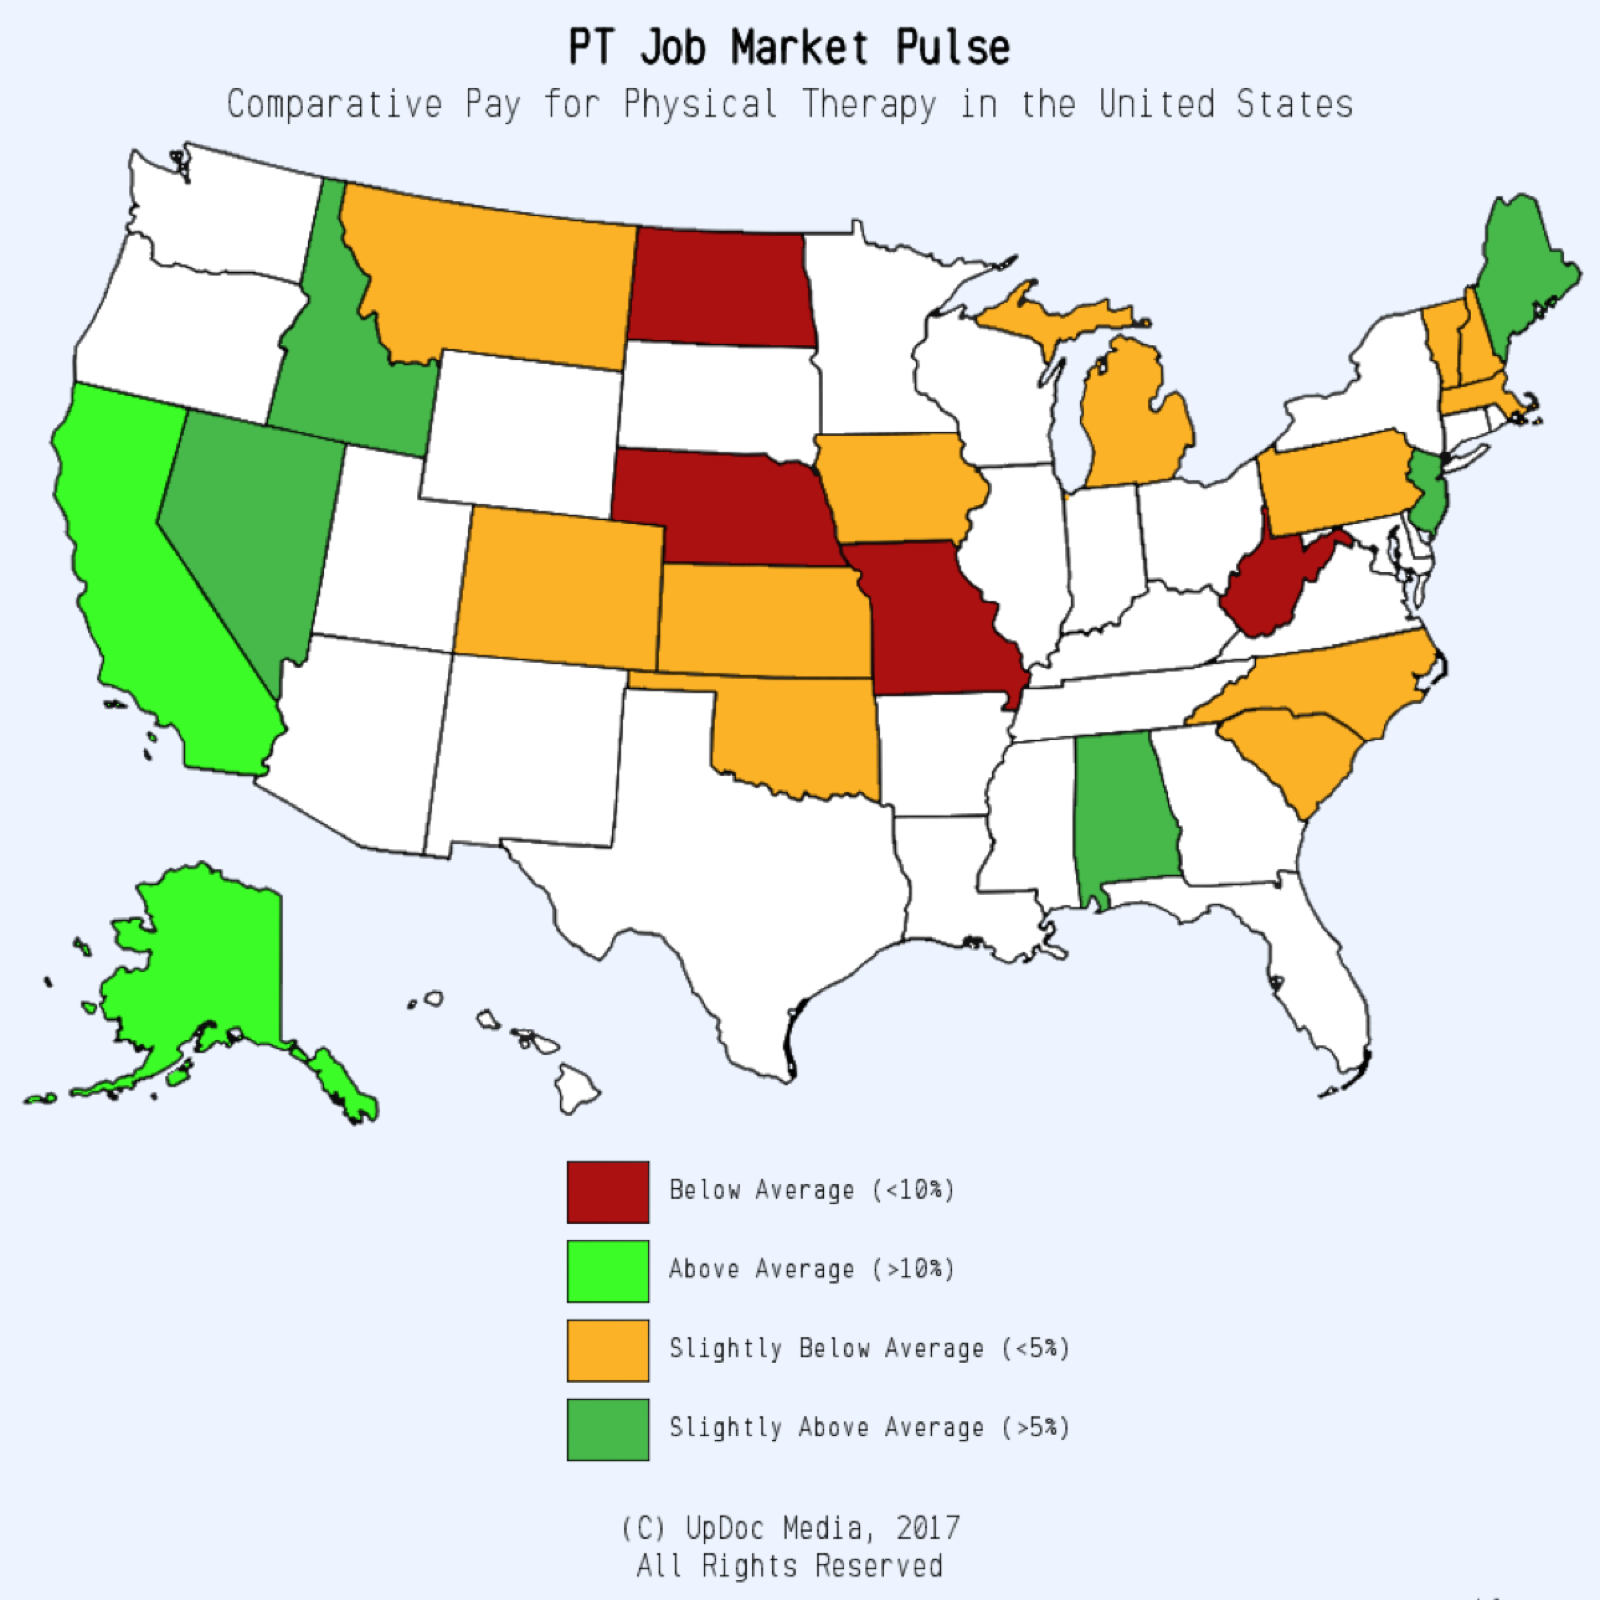 pt job market pulse 2017 - year one | updoc media, Human Body